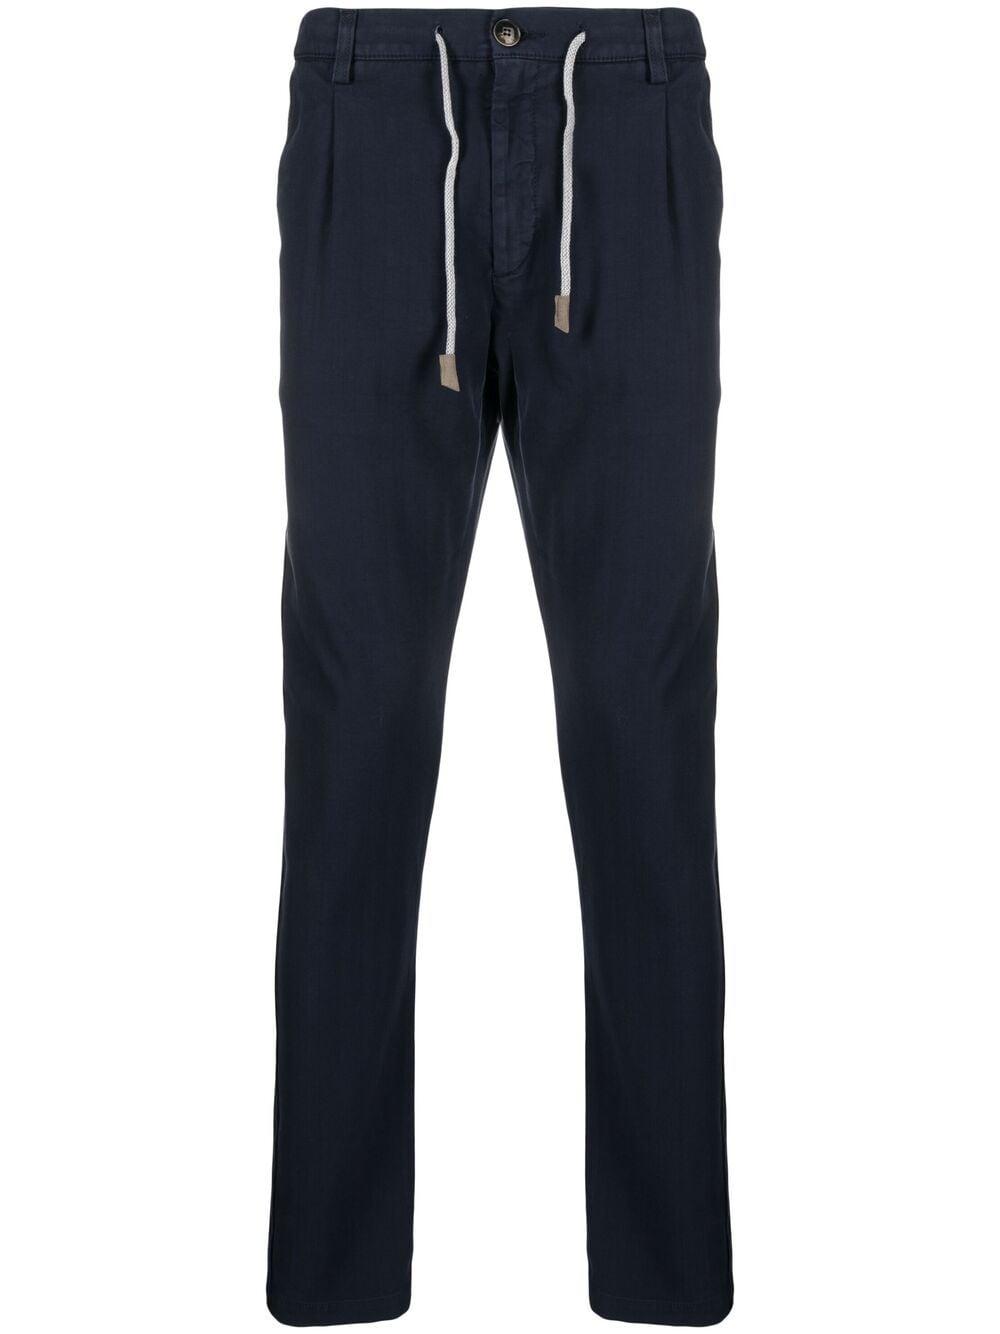 Pantaloni slim fit a vita media in cotone elasticizzato blu navy ELEVENTY | Pantaloni | C70PANC01-TET0C02811